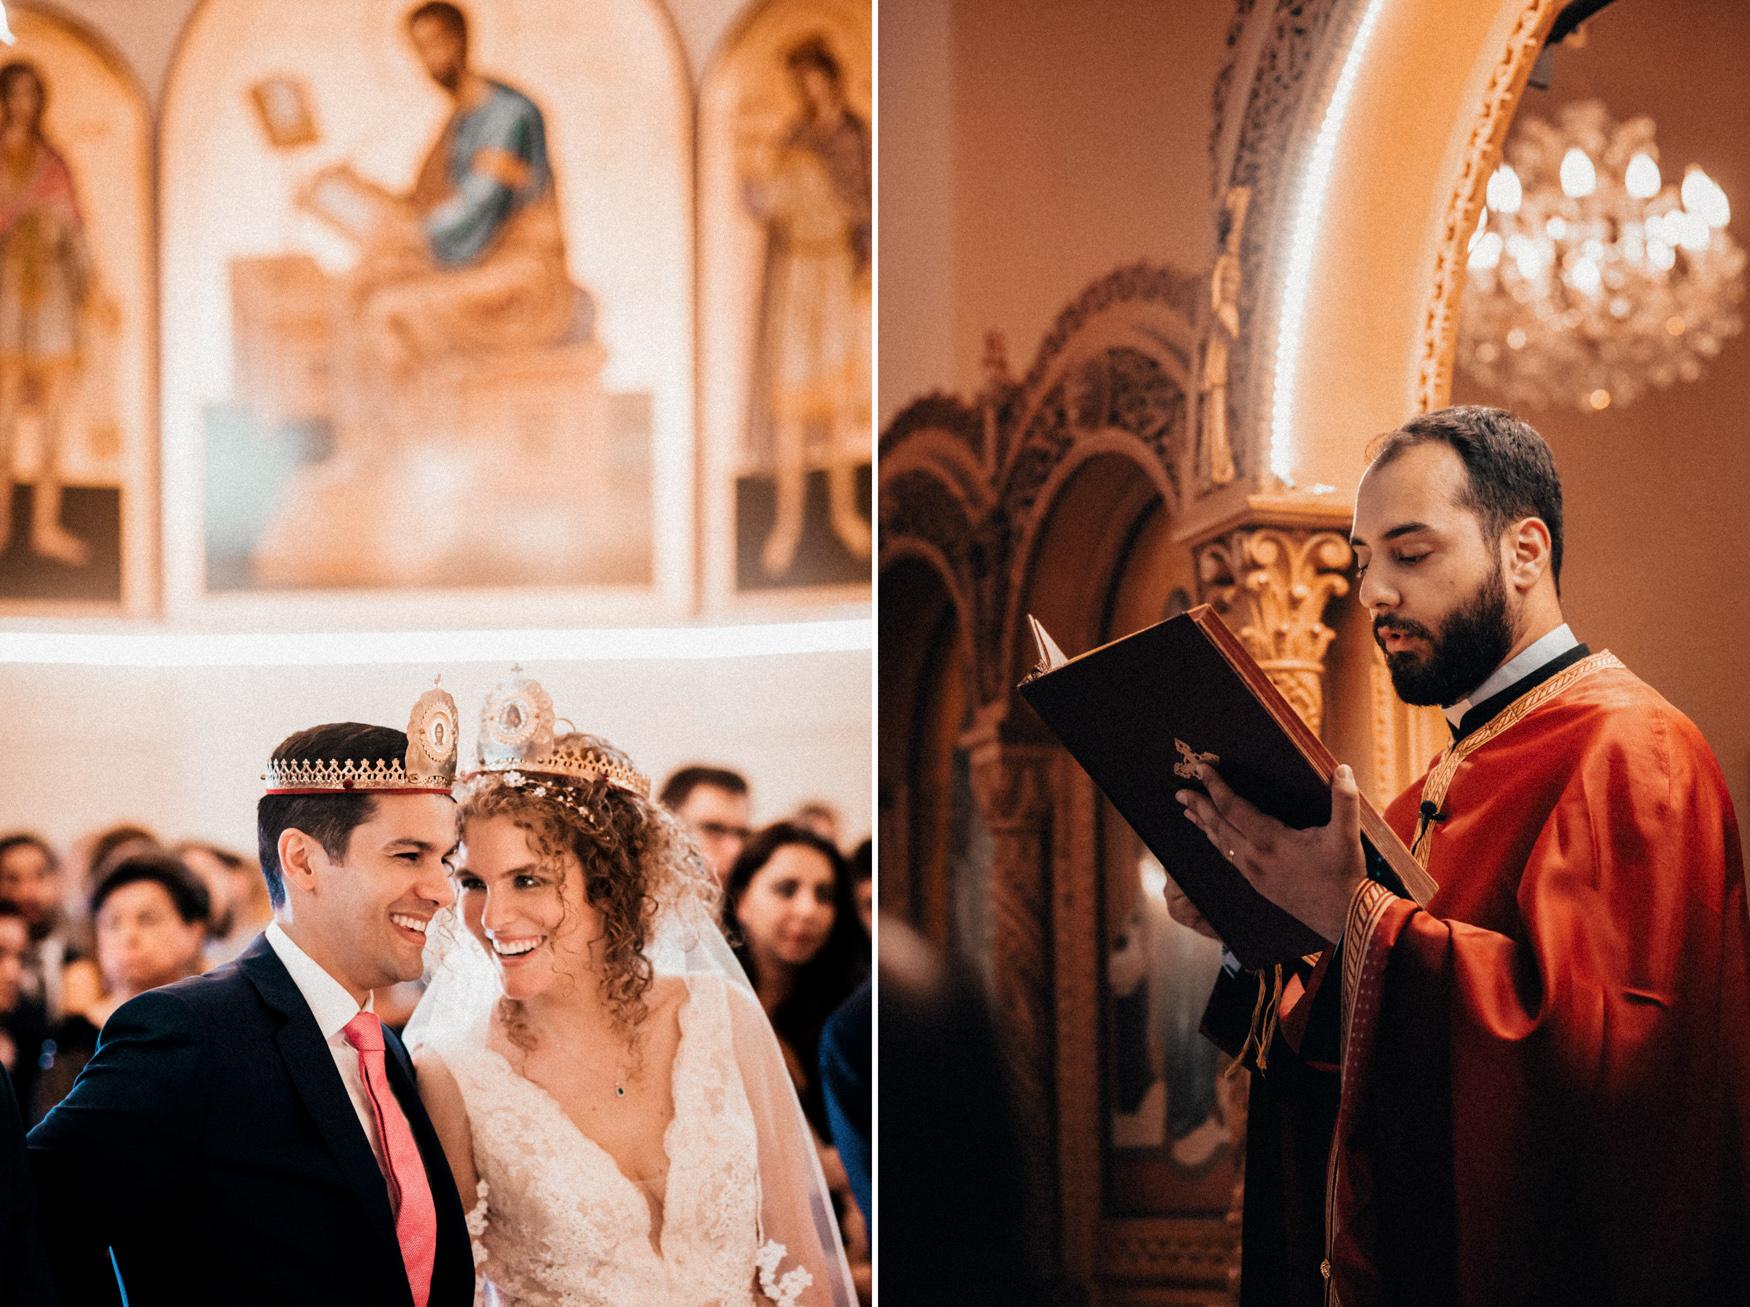 LR3 byblos beirut church wedding ceremony lebanon 009.jpg